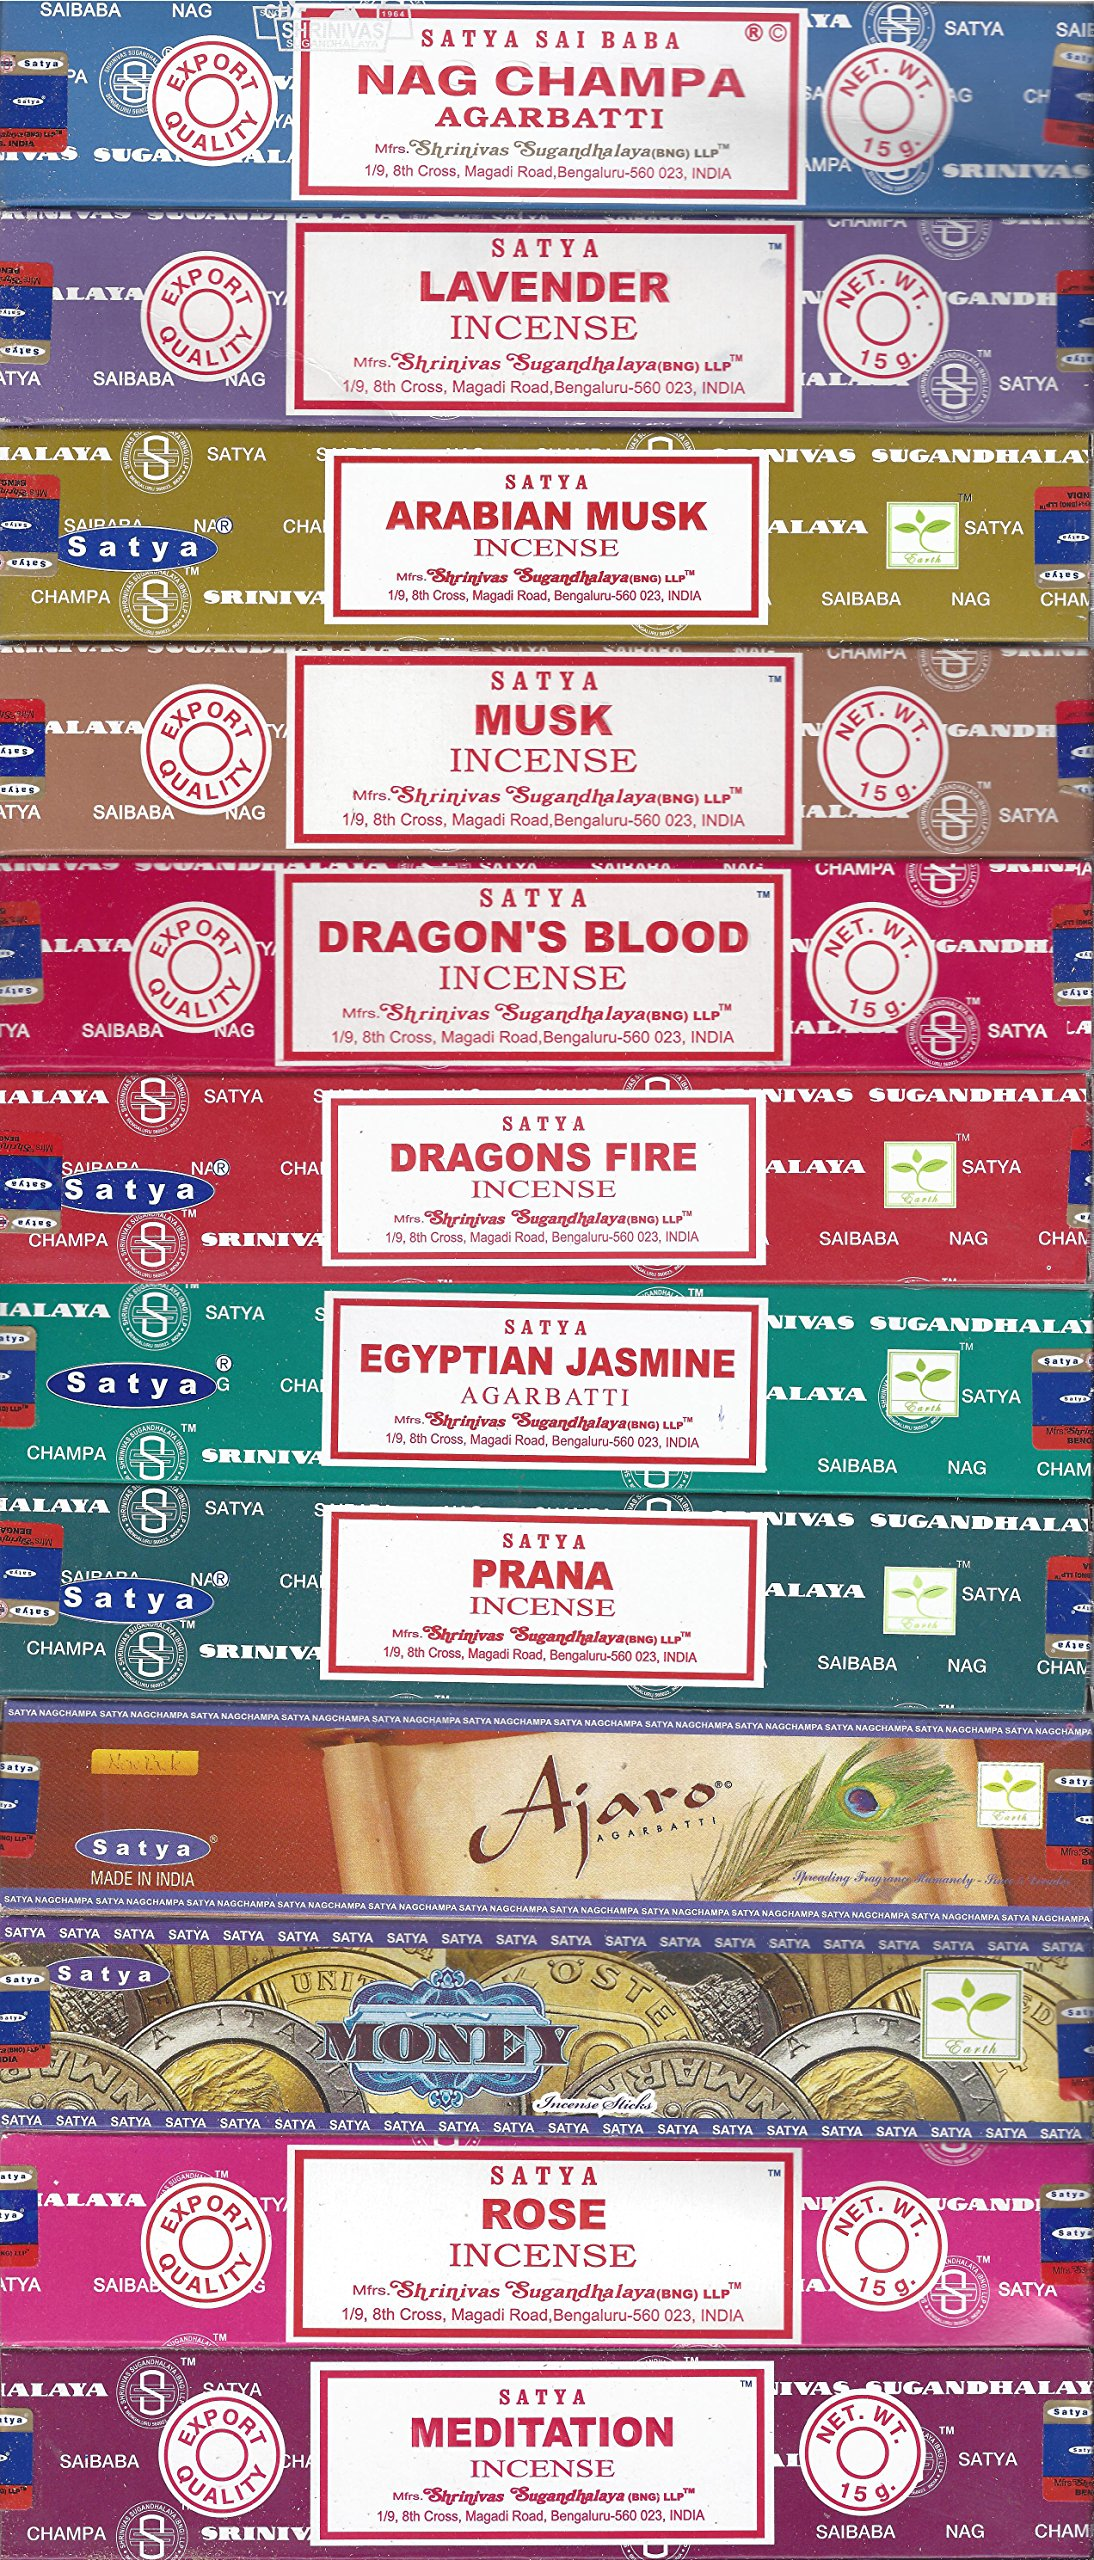 Set of 12 Nag Champa, Lavender, Arabian Musk, Egytian Jasmine, Musk, Dragon's Fire, Dragon's Blood, Prana, Ajaro, Money, Rose, Meditation by Satya